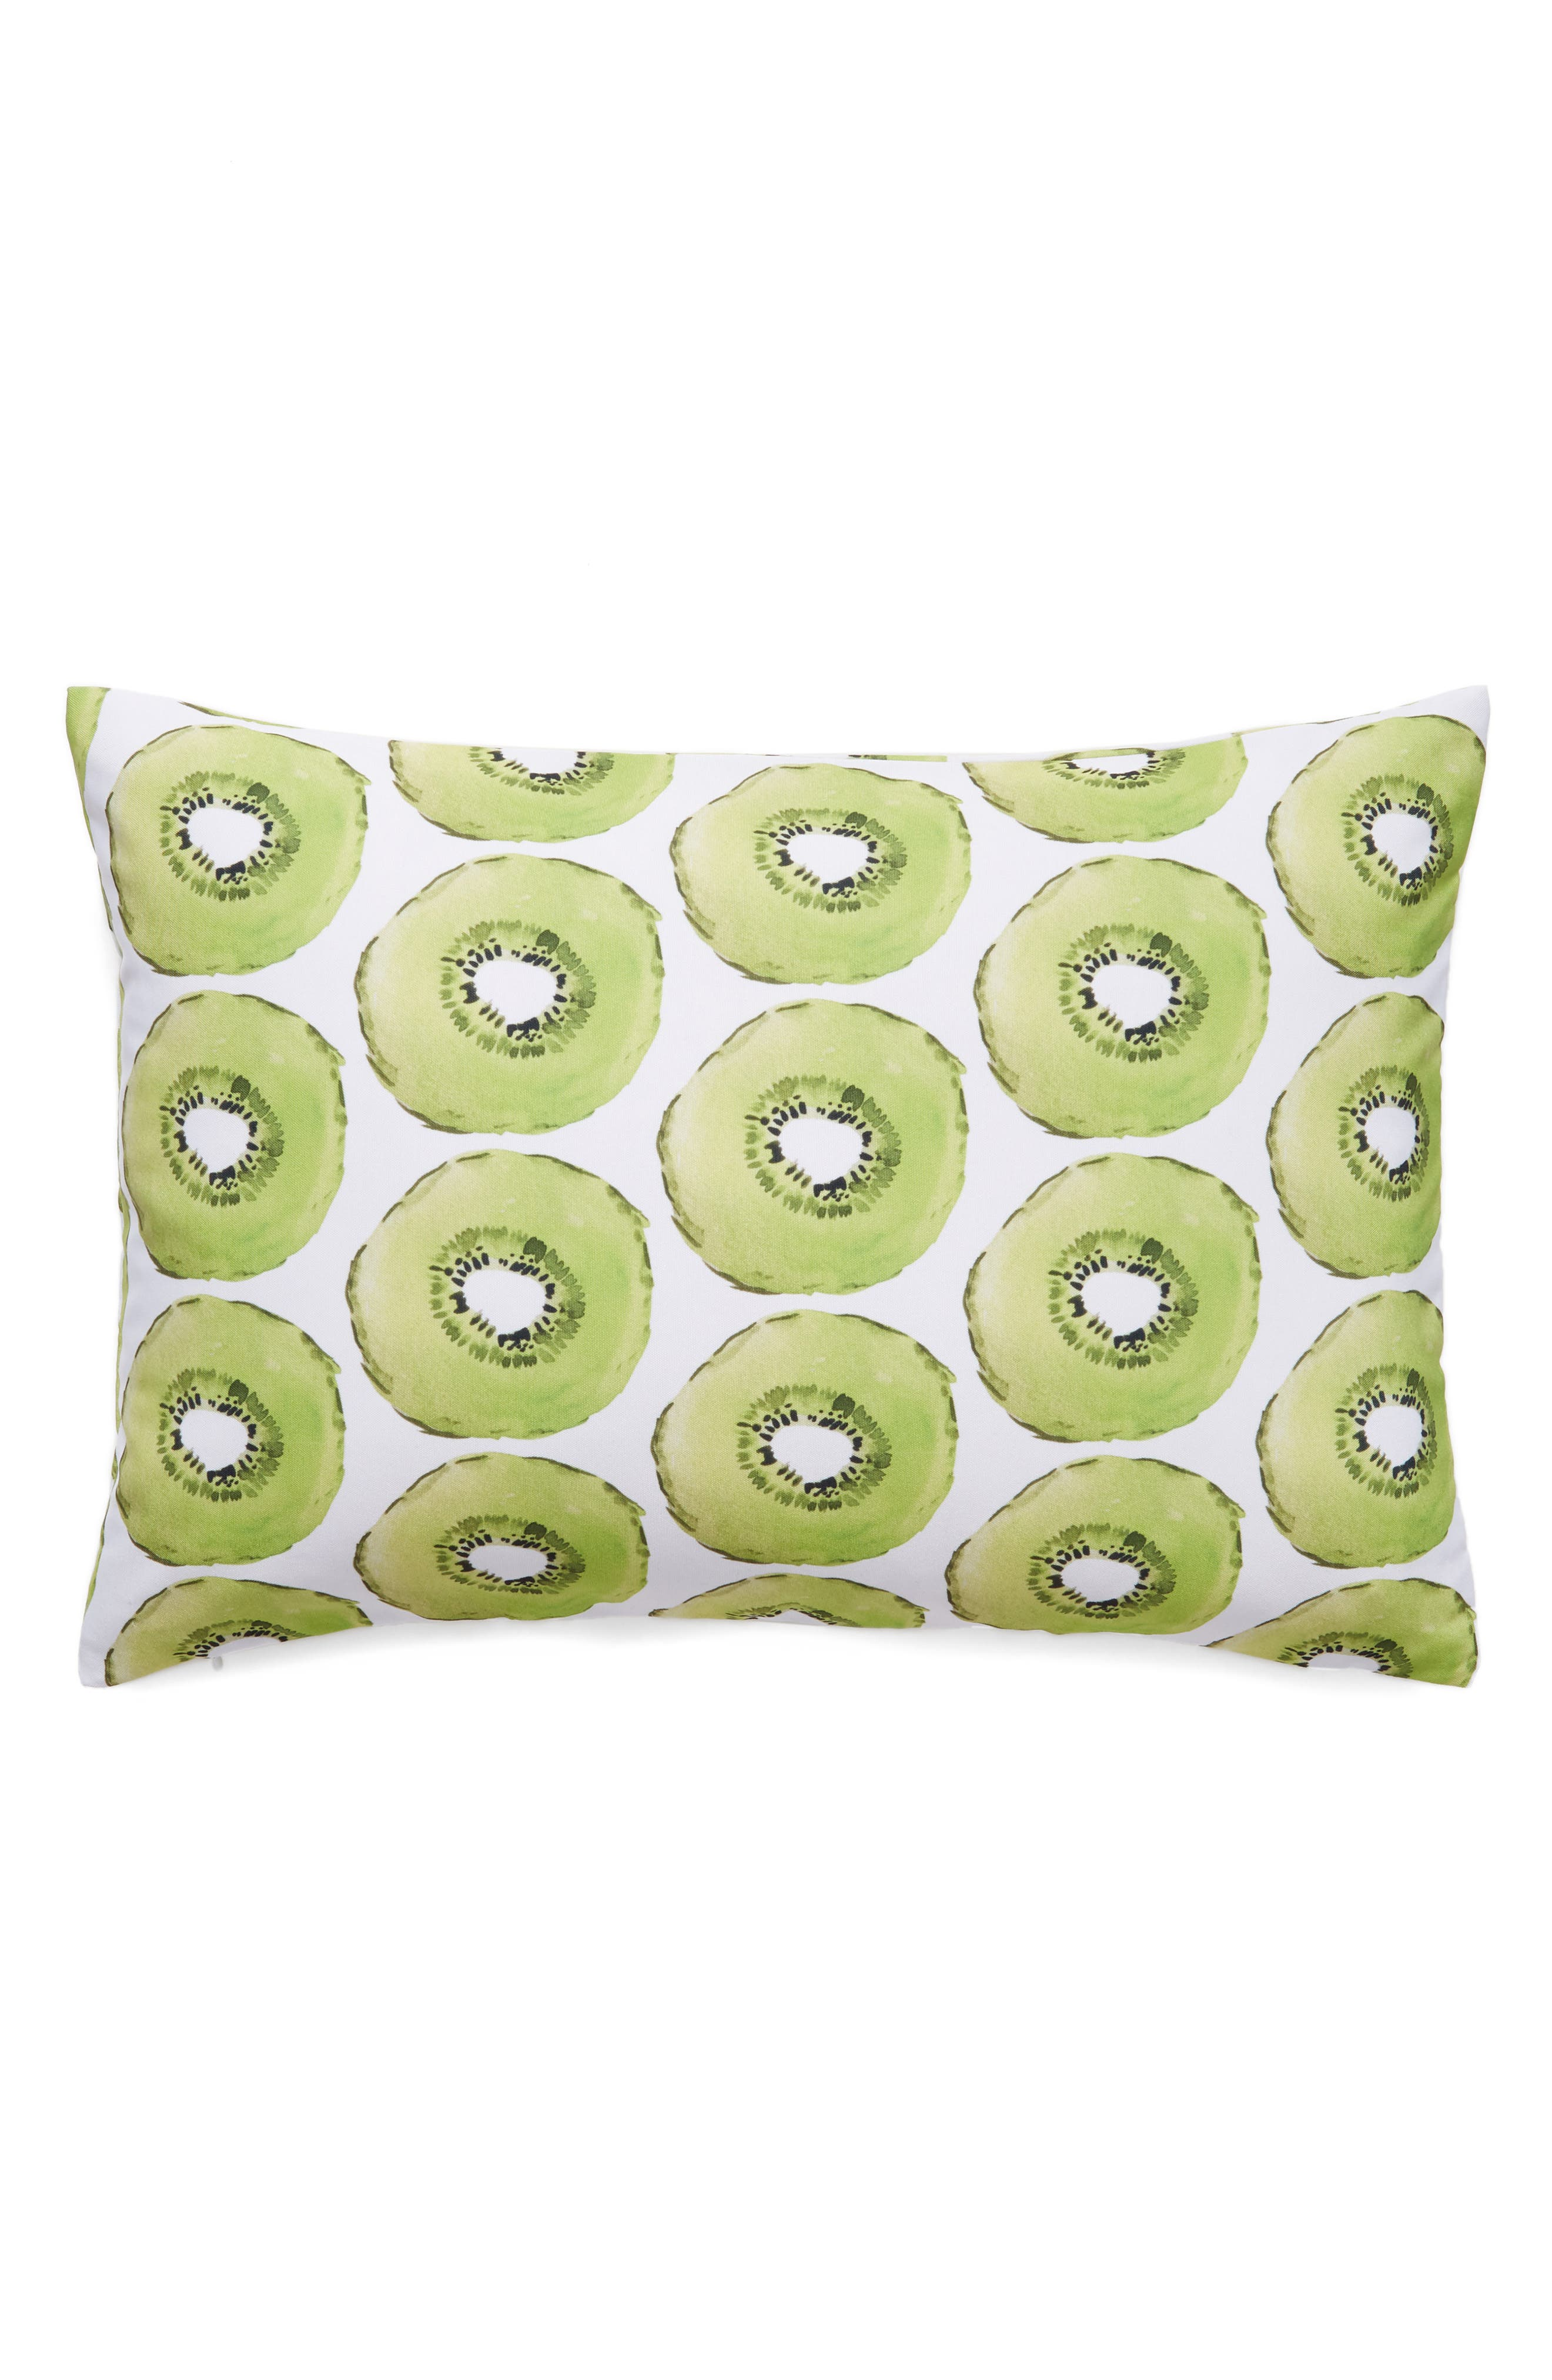 Kiwi Accent Pillow,                         Main,                         color, Green